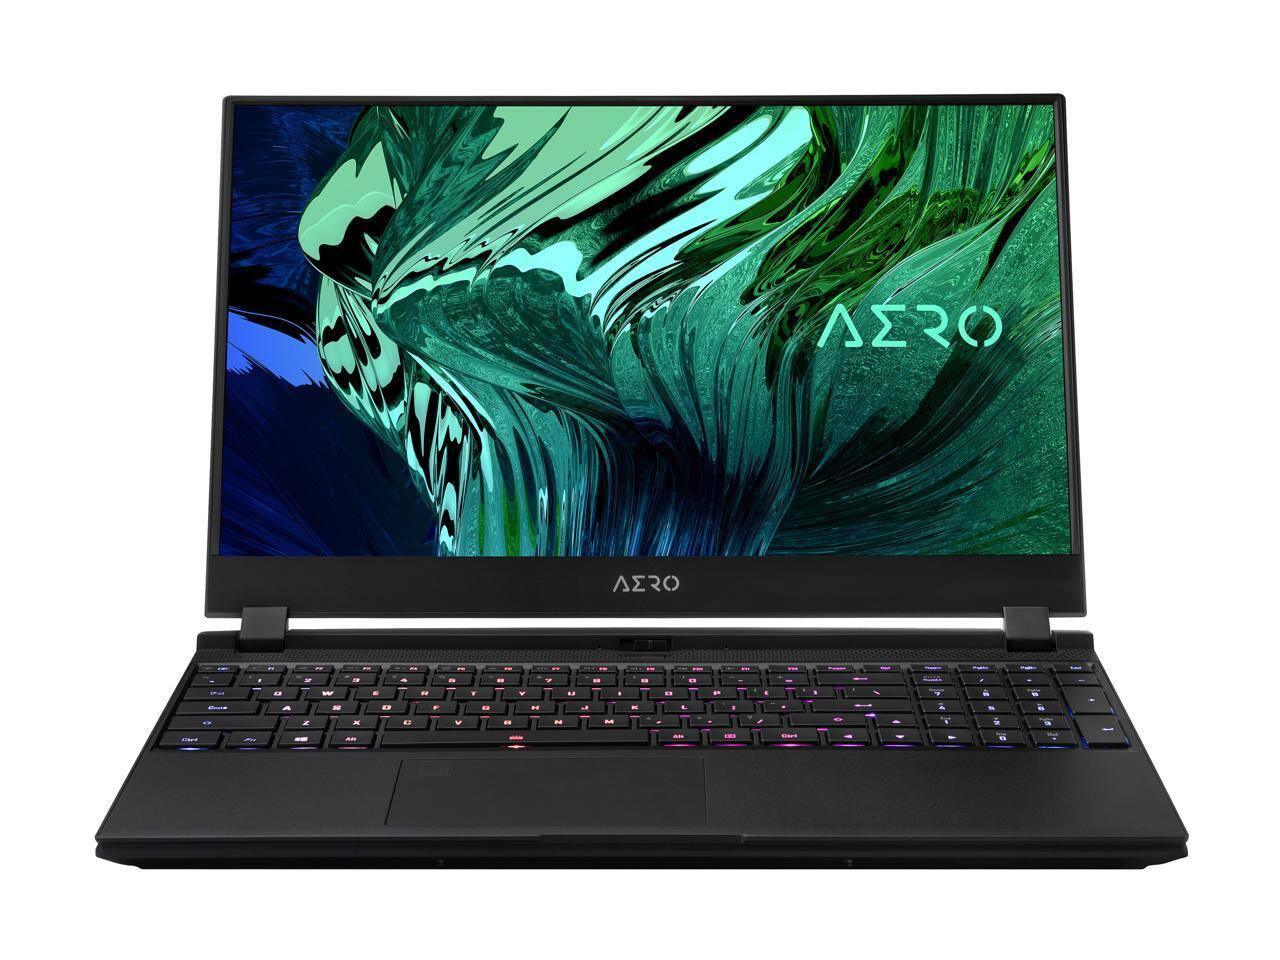 GIGABYTE AERO 15 XC-8US1130SH Gaming Laptop [Intel Core i7-10870H 2.20 GHz, RTX 3070] $1549